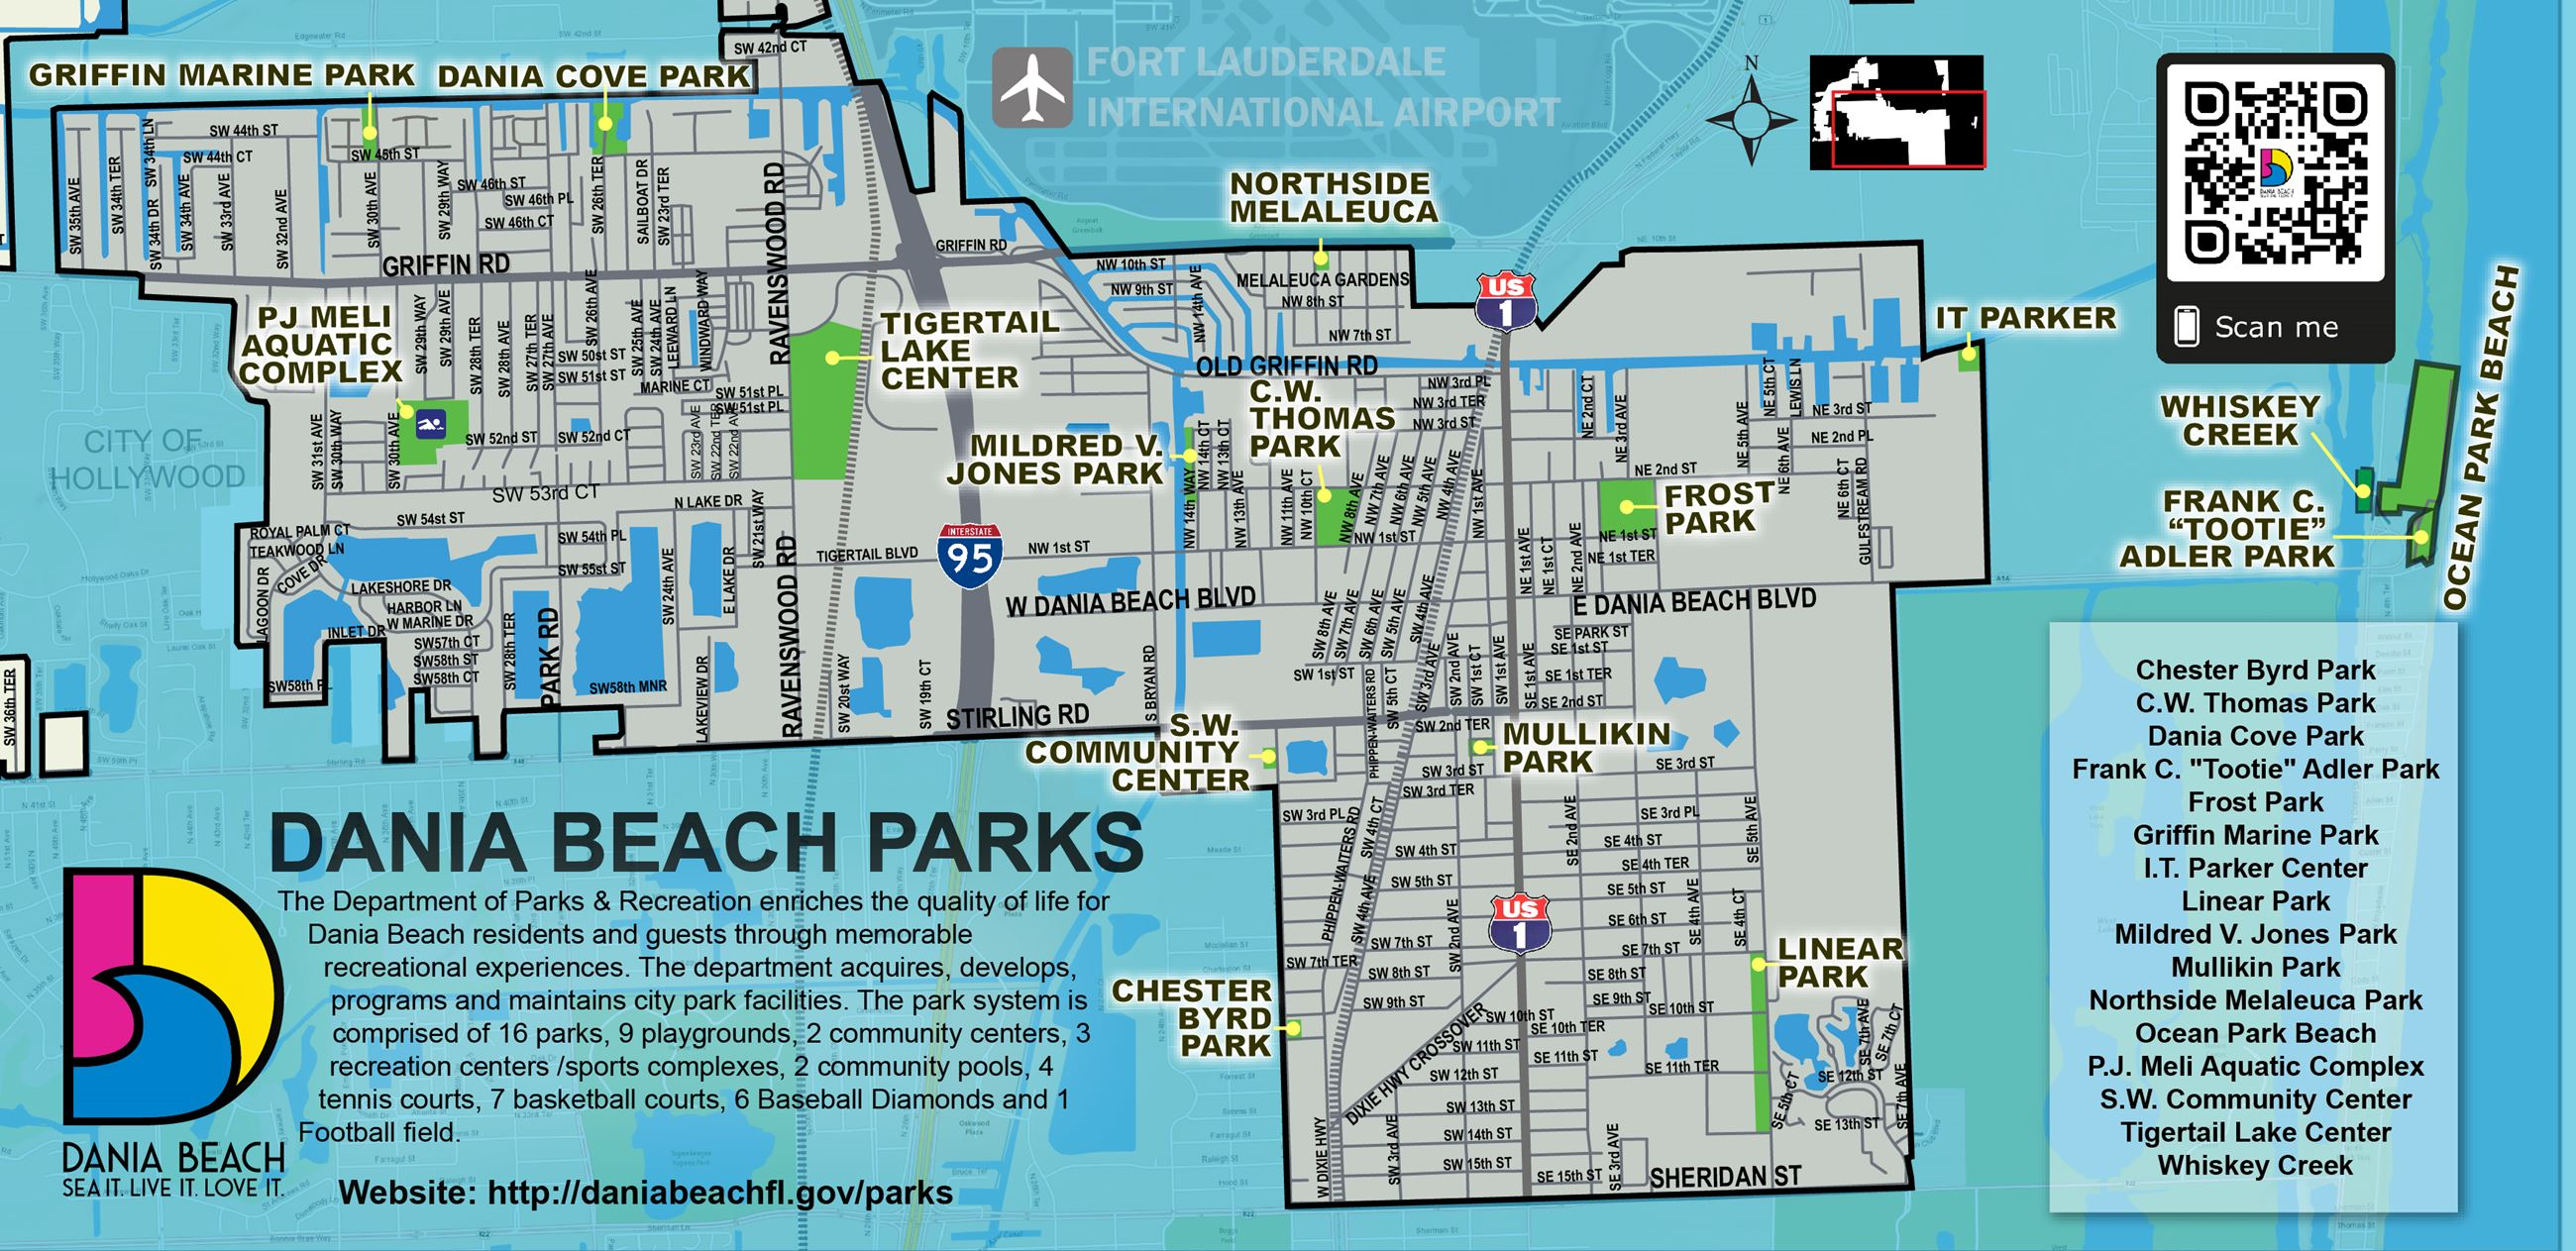 Dania Beach, Florida - Broward First City - Official Web Site on